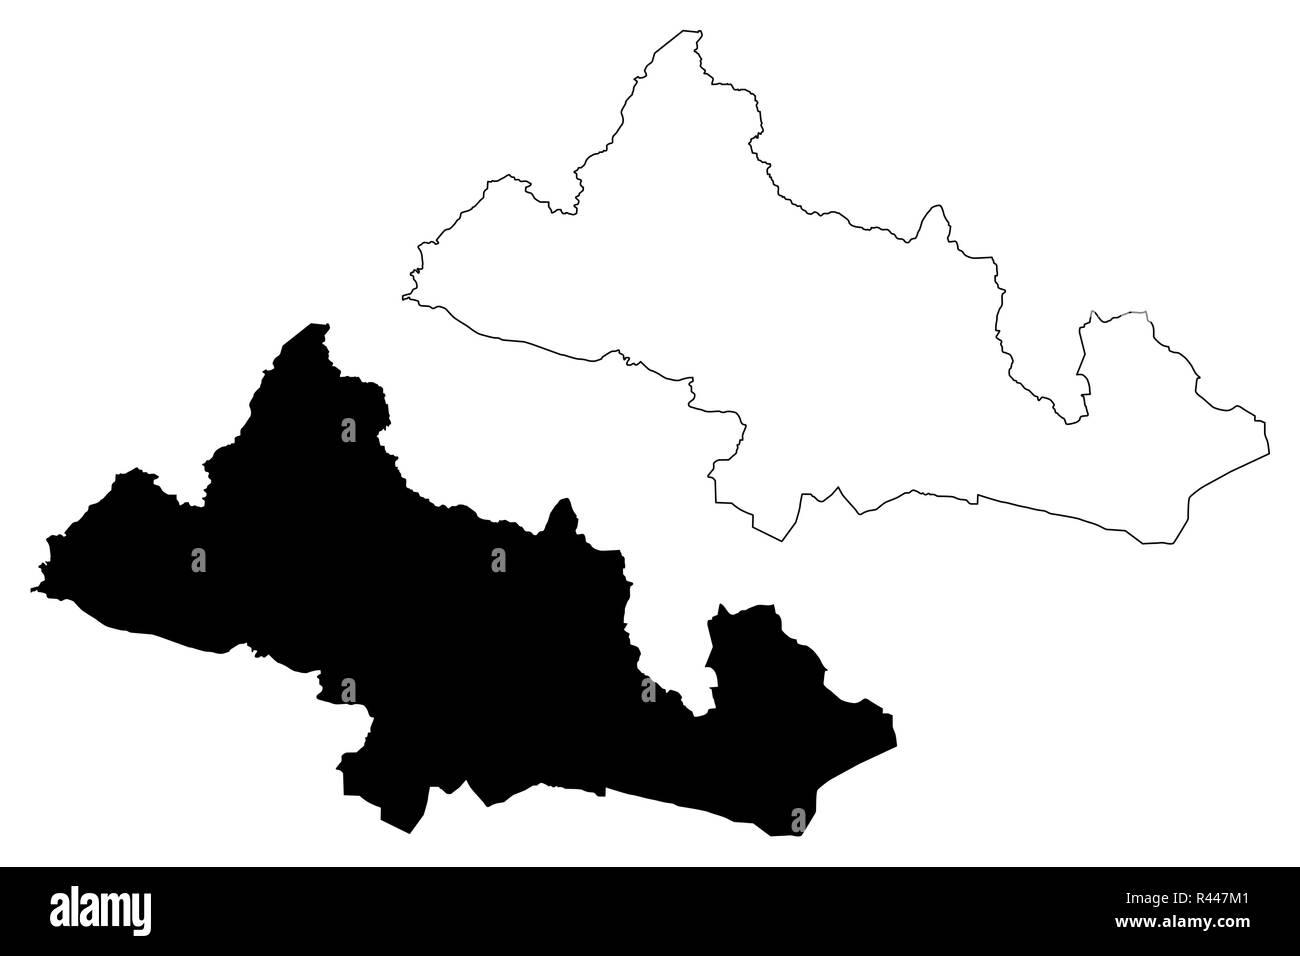 Kilis (Provinces of the Republic of Turkey) map vector illustration, scribble sketch Kilis ili map - Stock Image